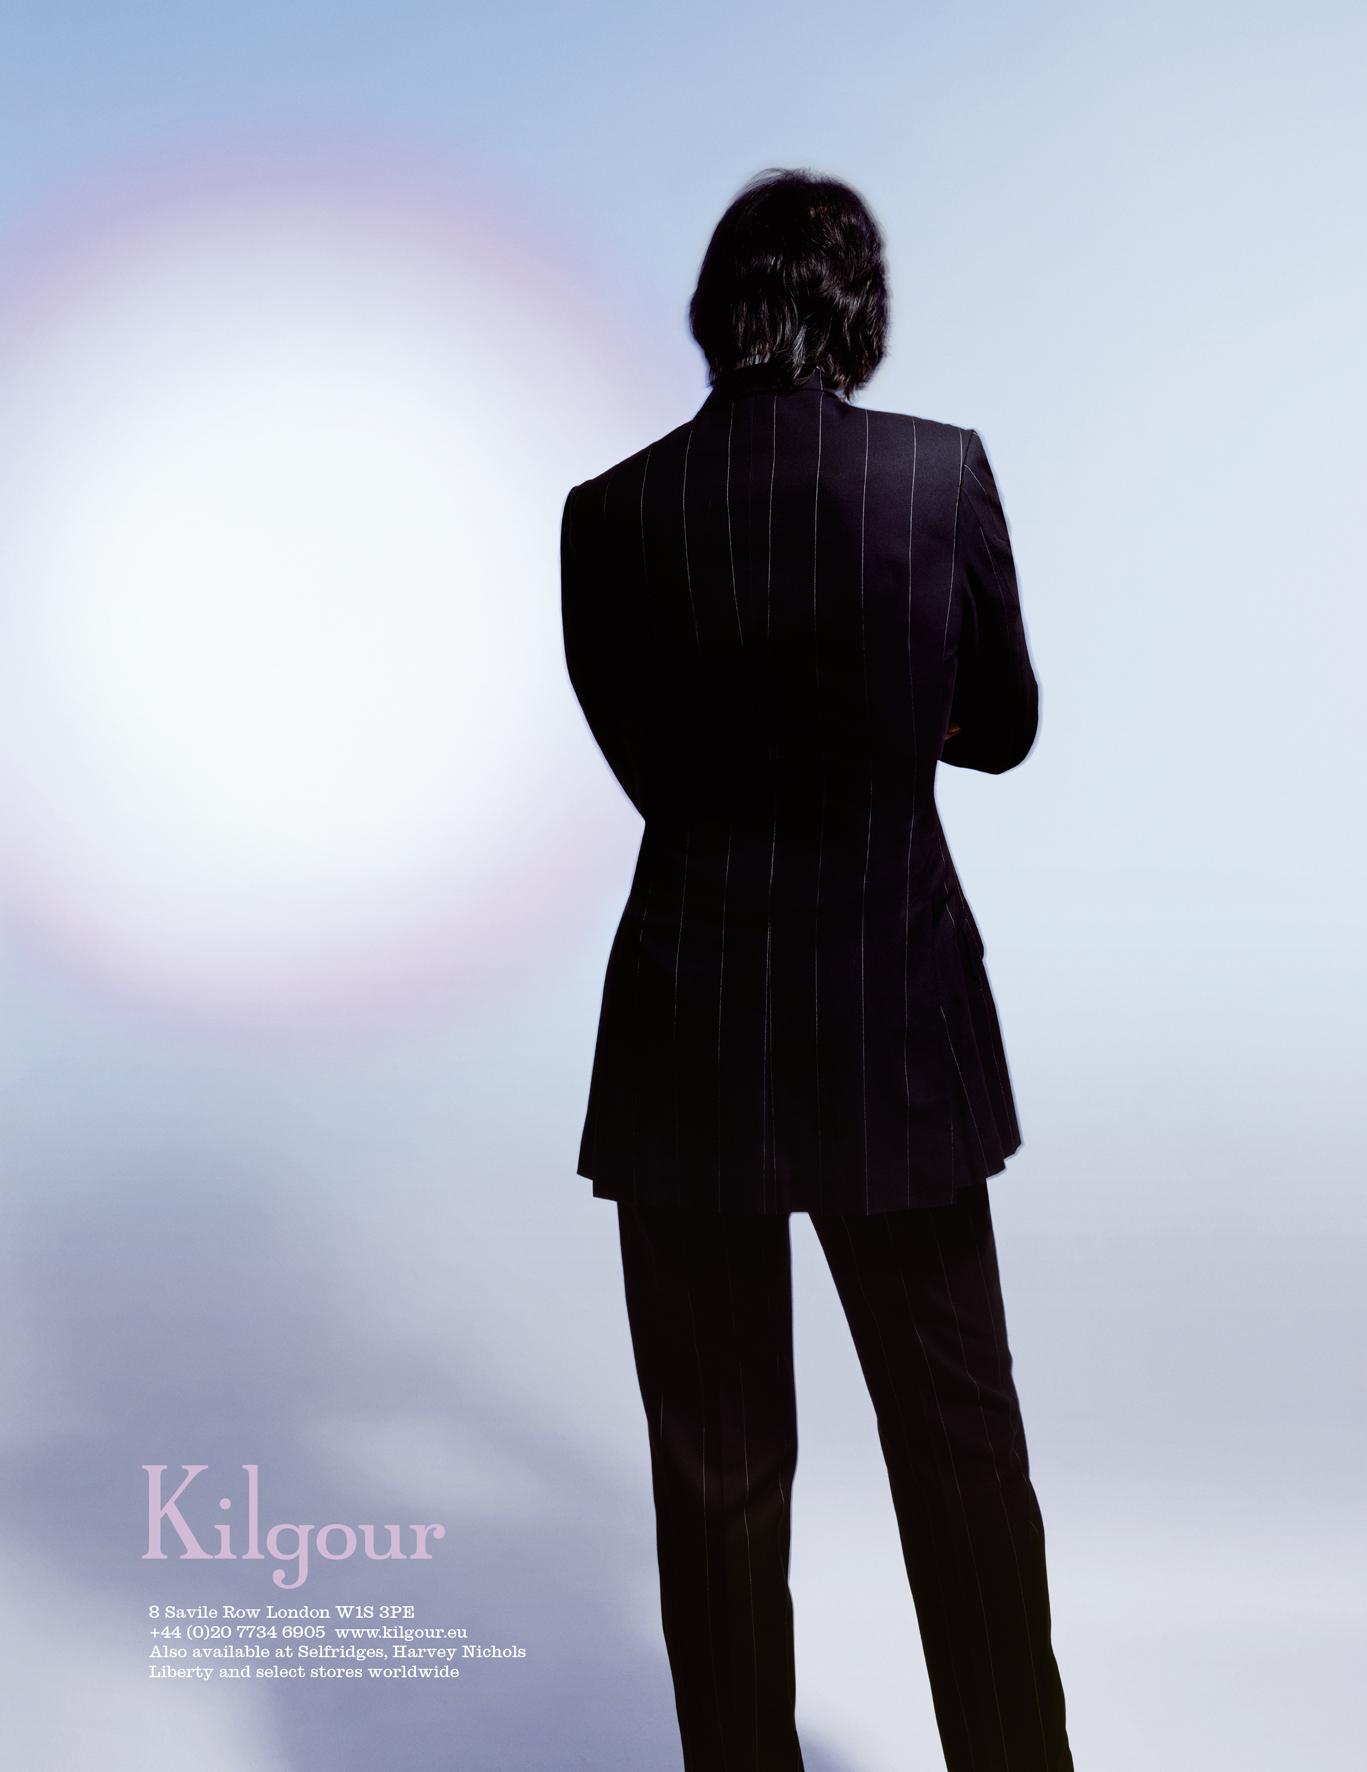 Kilgour peter Back.png